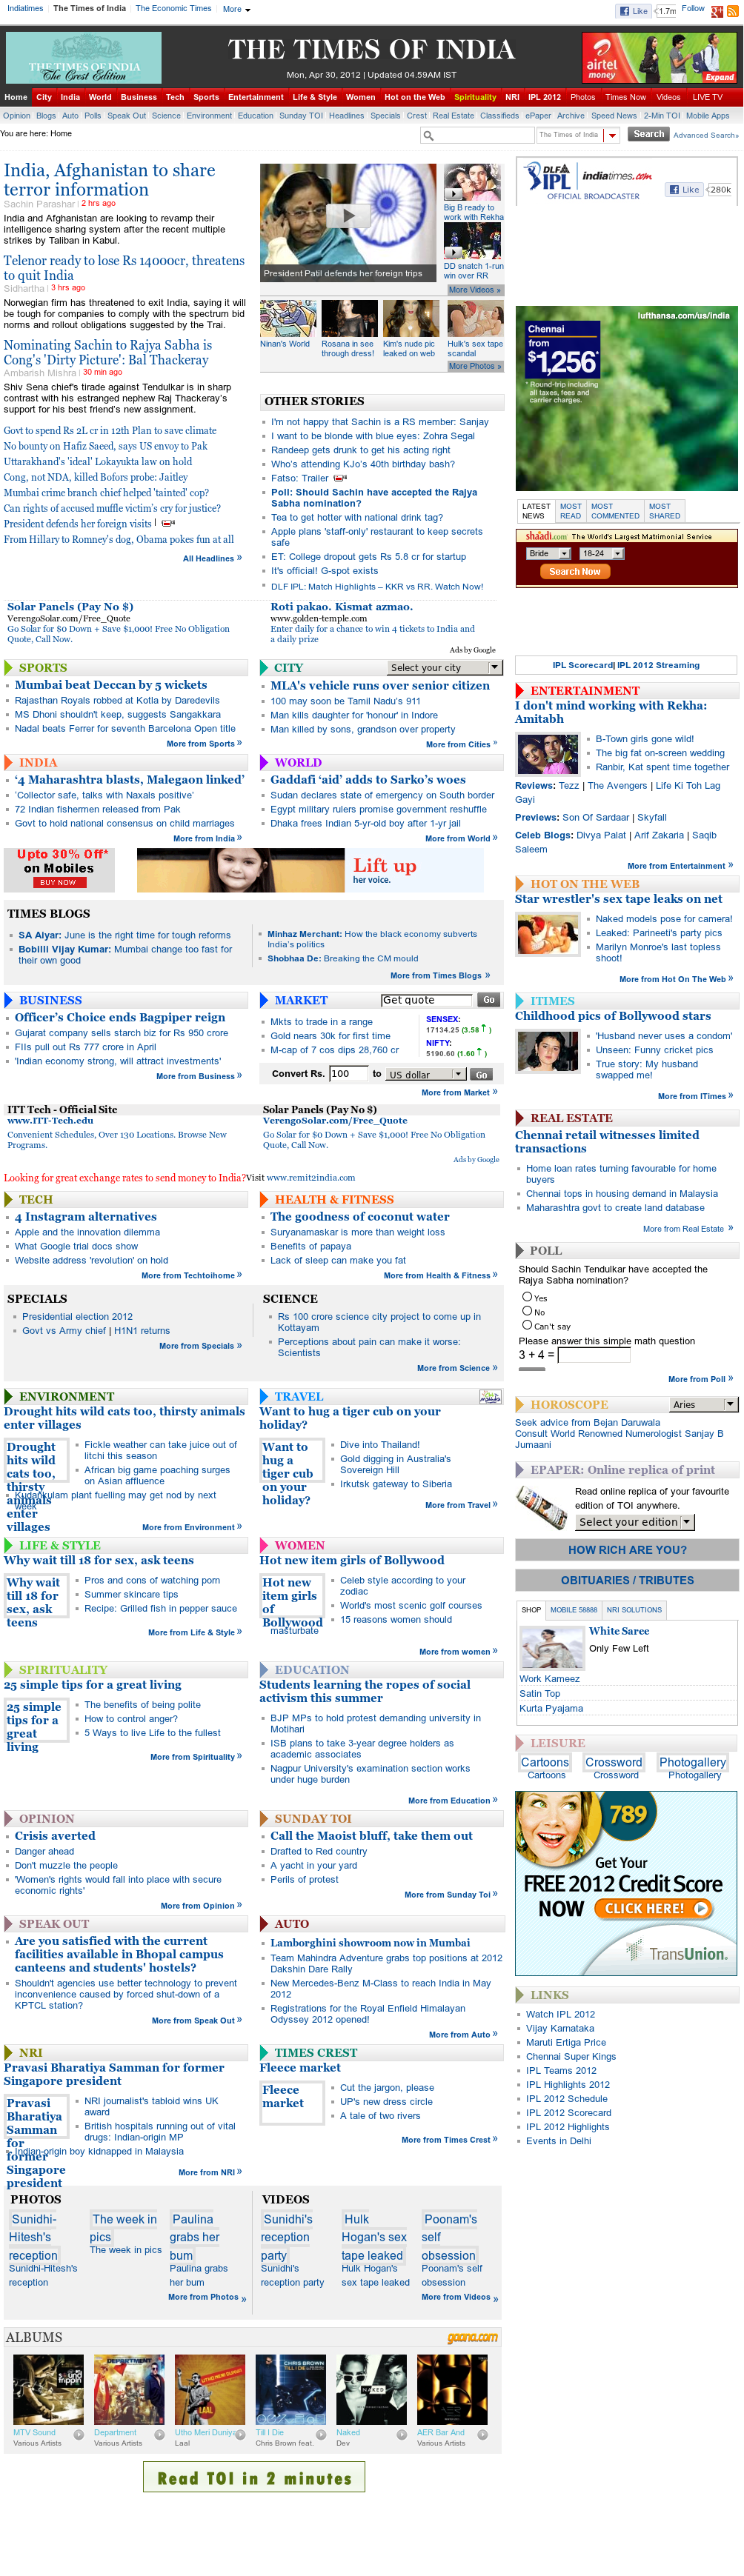 The Times of India at Sunday April 29, 2012, 11:32 p.m. UTC